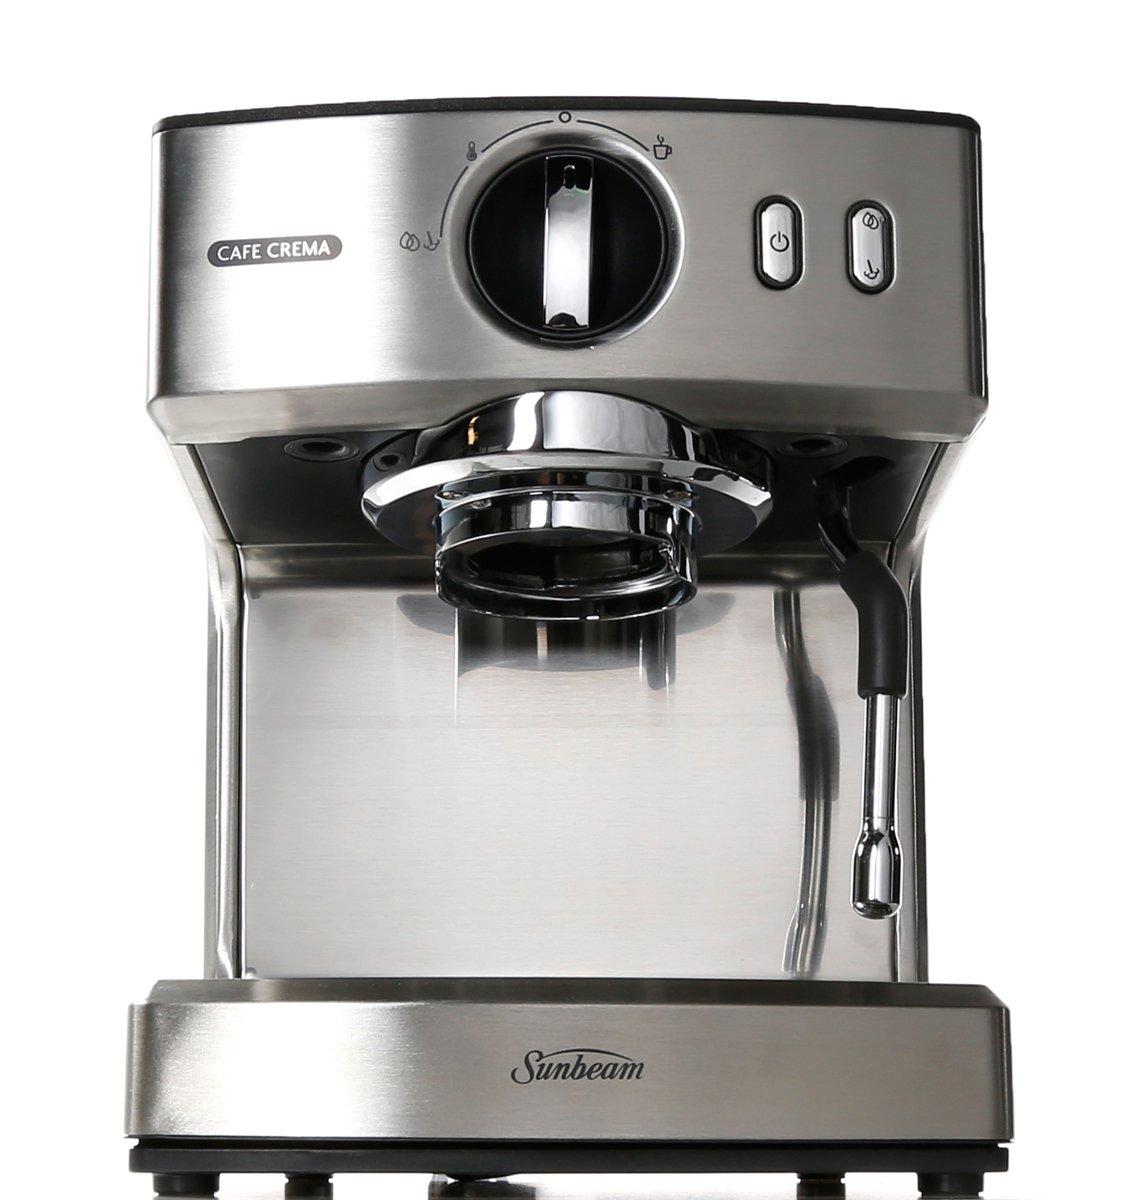 Sunbeam Cafe Crema Ii Coffee Machine Em4820 Winning Commercial